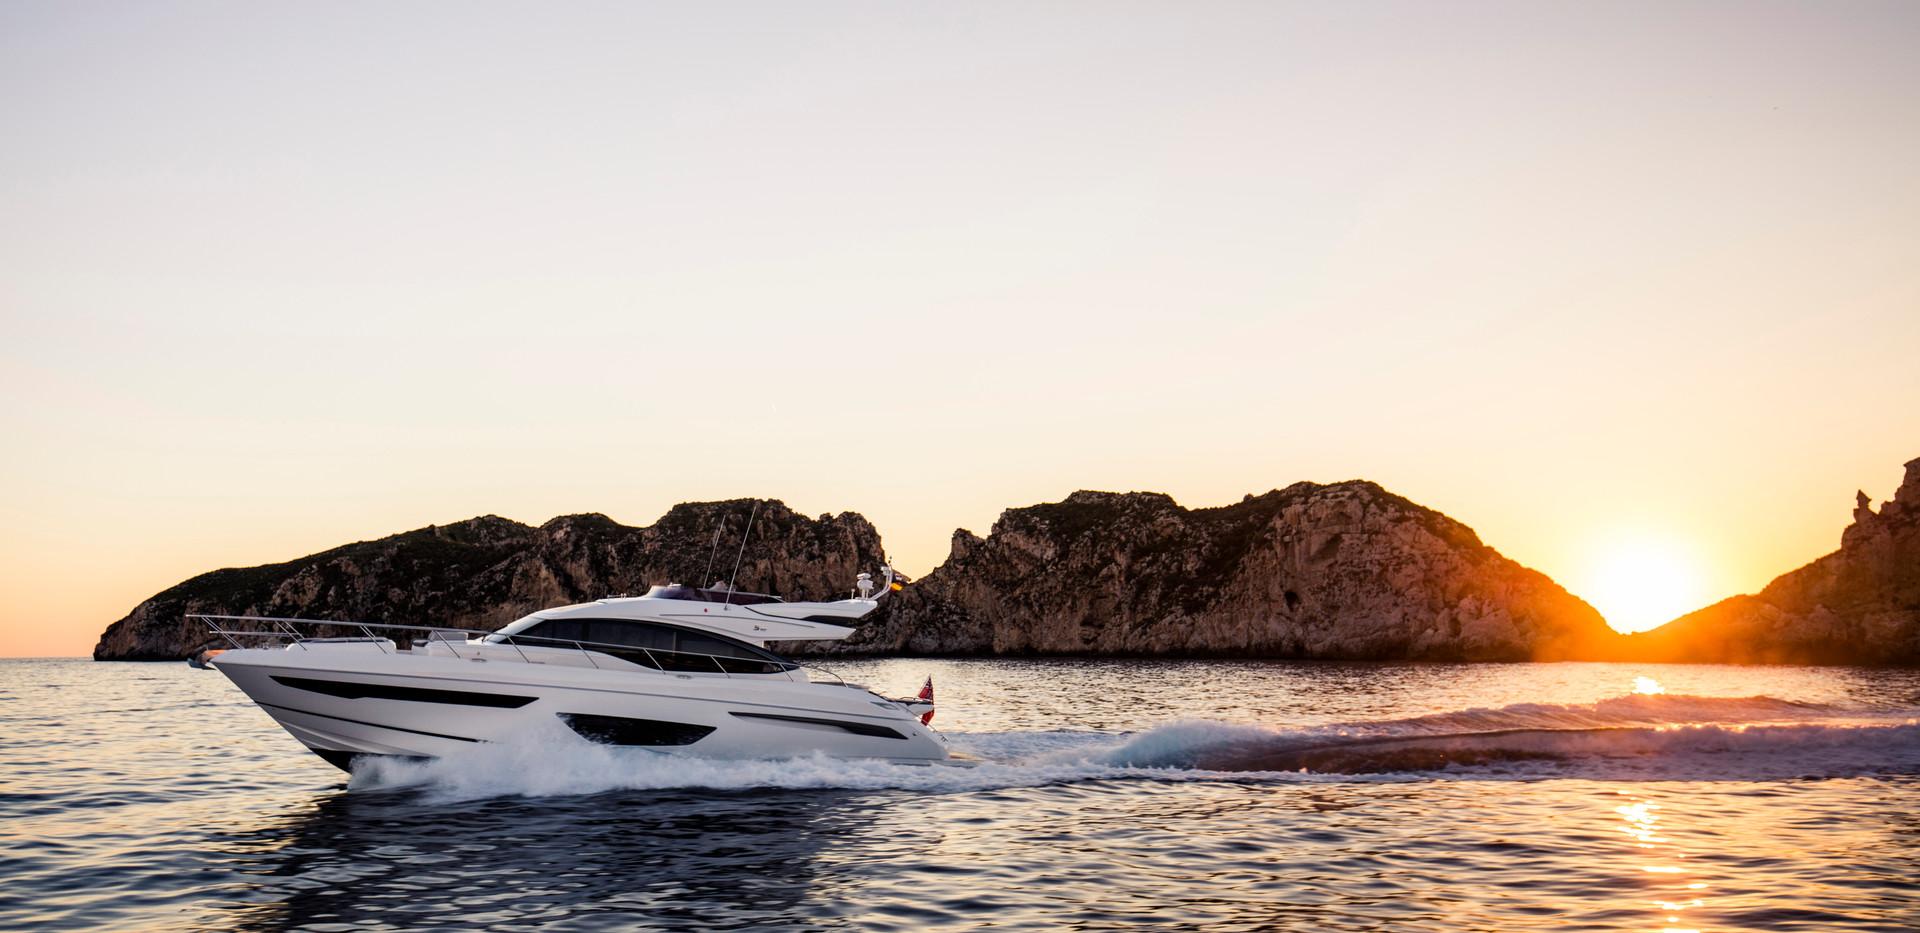 s65-exterior-white-hull-1Abromowitz Shar